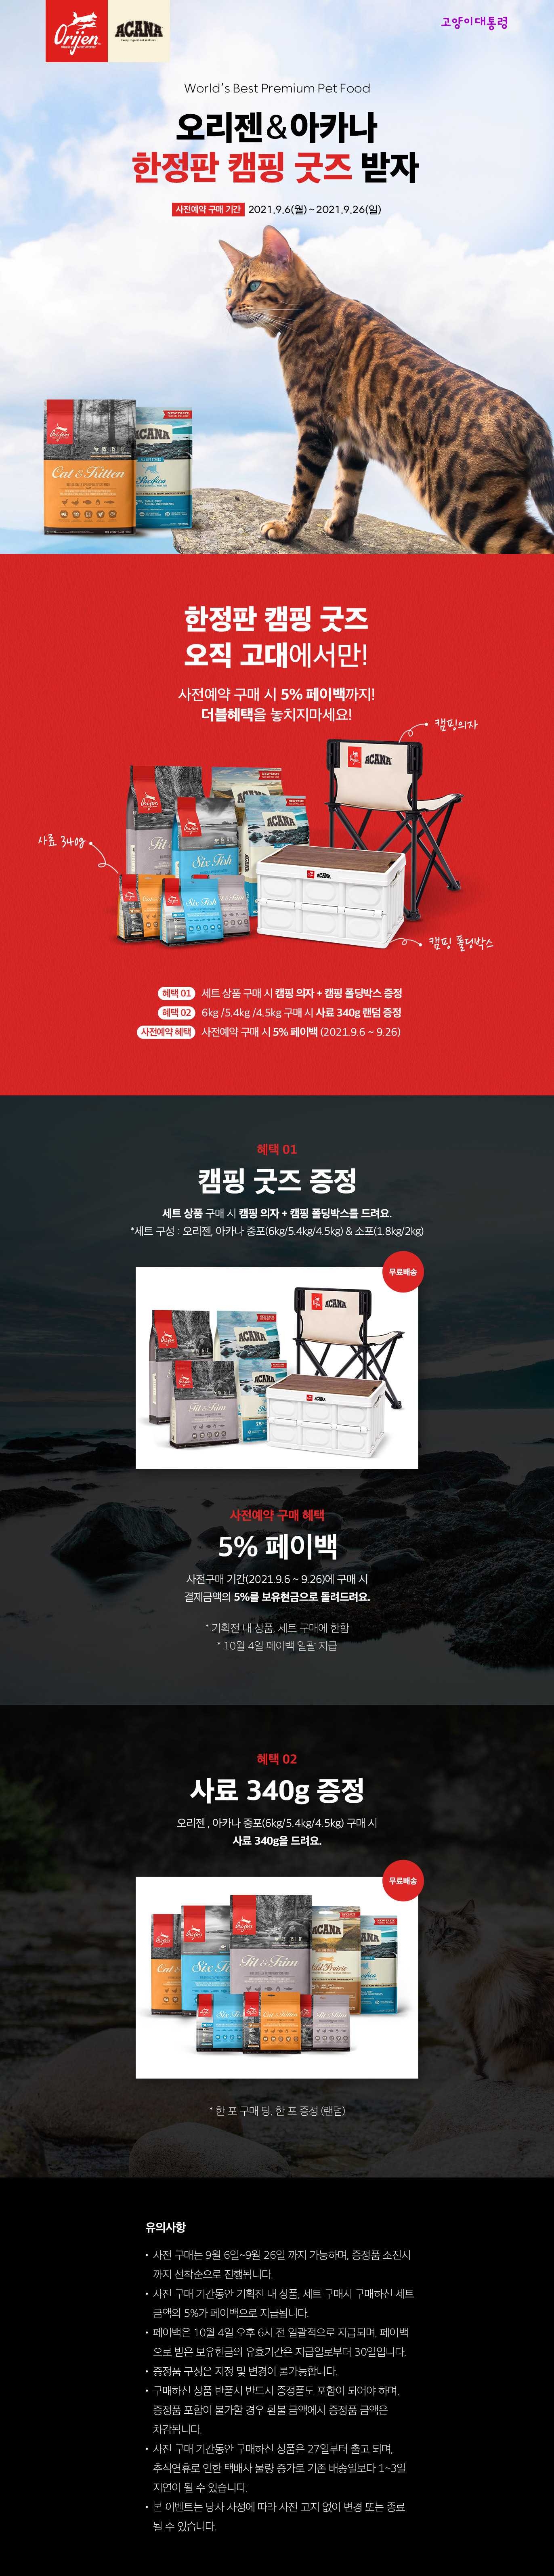 https://img.catpre.com/web/catpre/event/banner/2843/2843_main_banner_5988.jpg